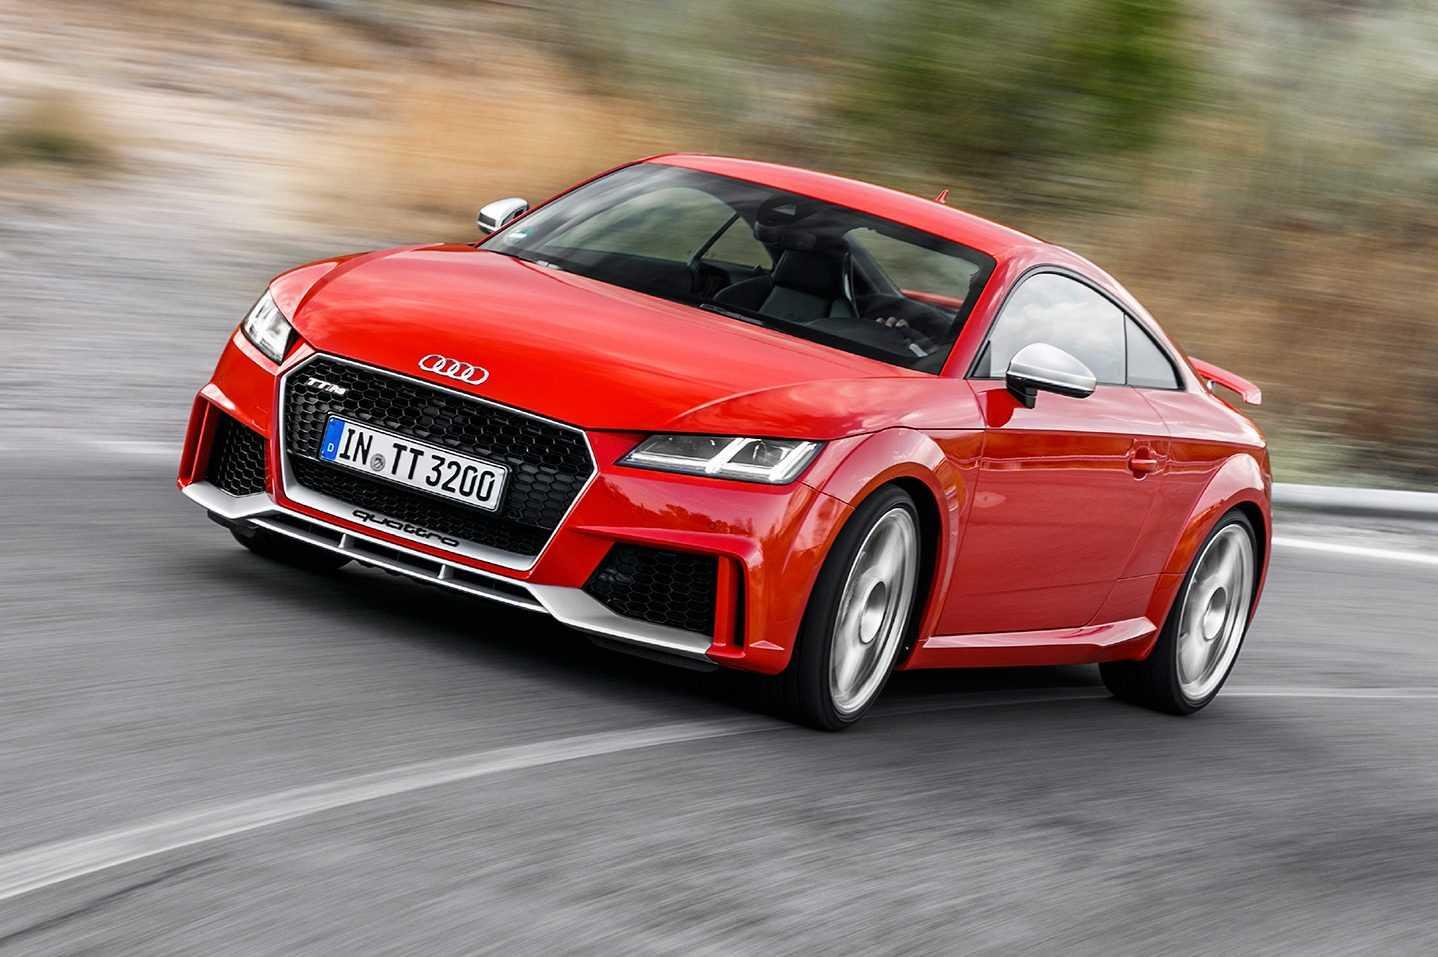 Audi TT характеристики тест драйв двигатель трансмиссия фото видео